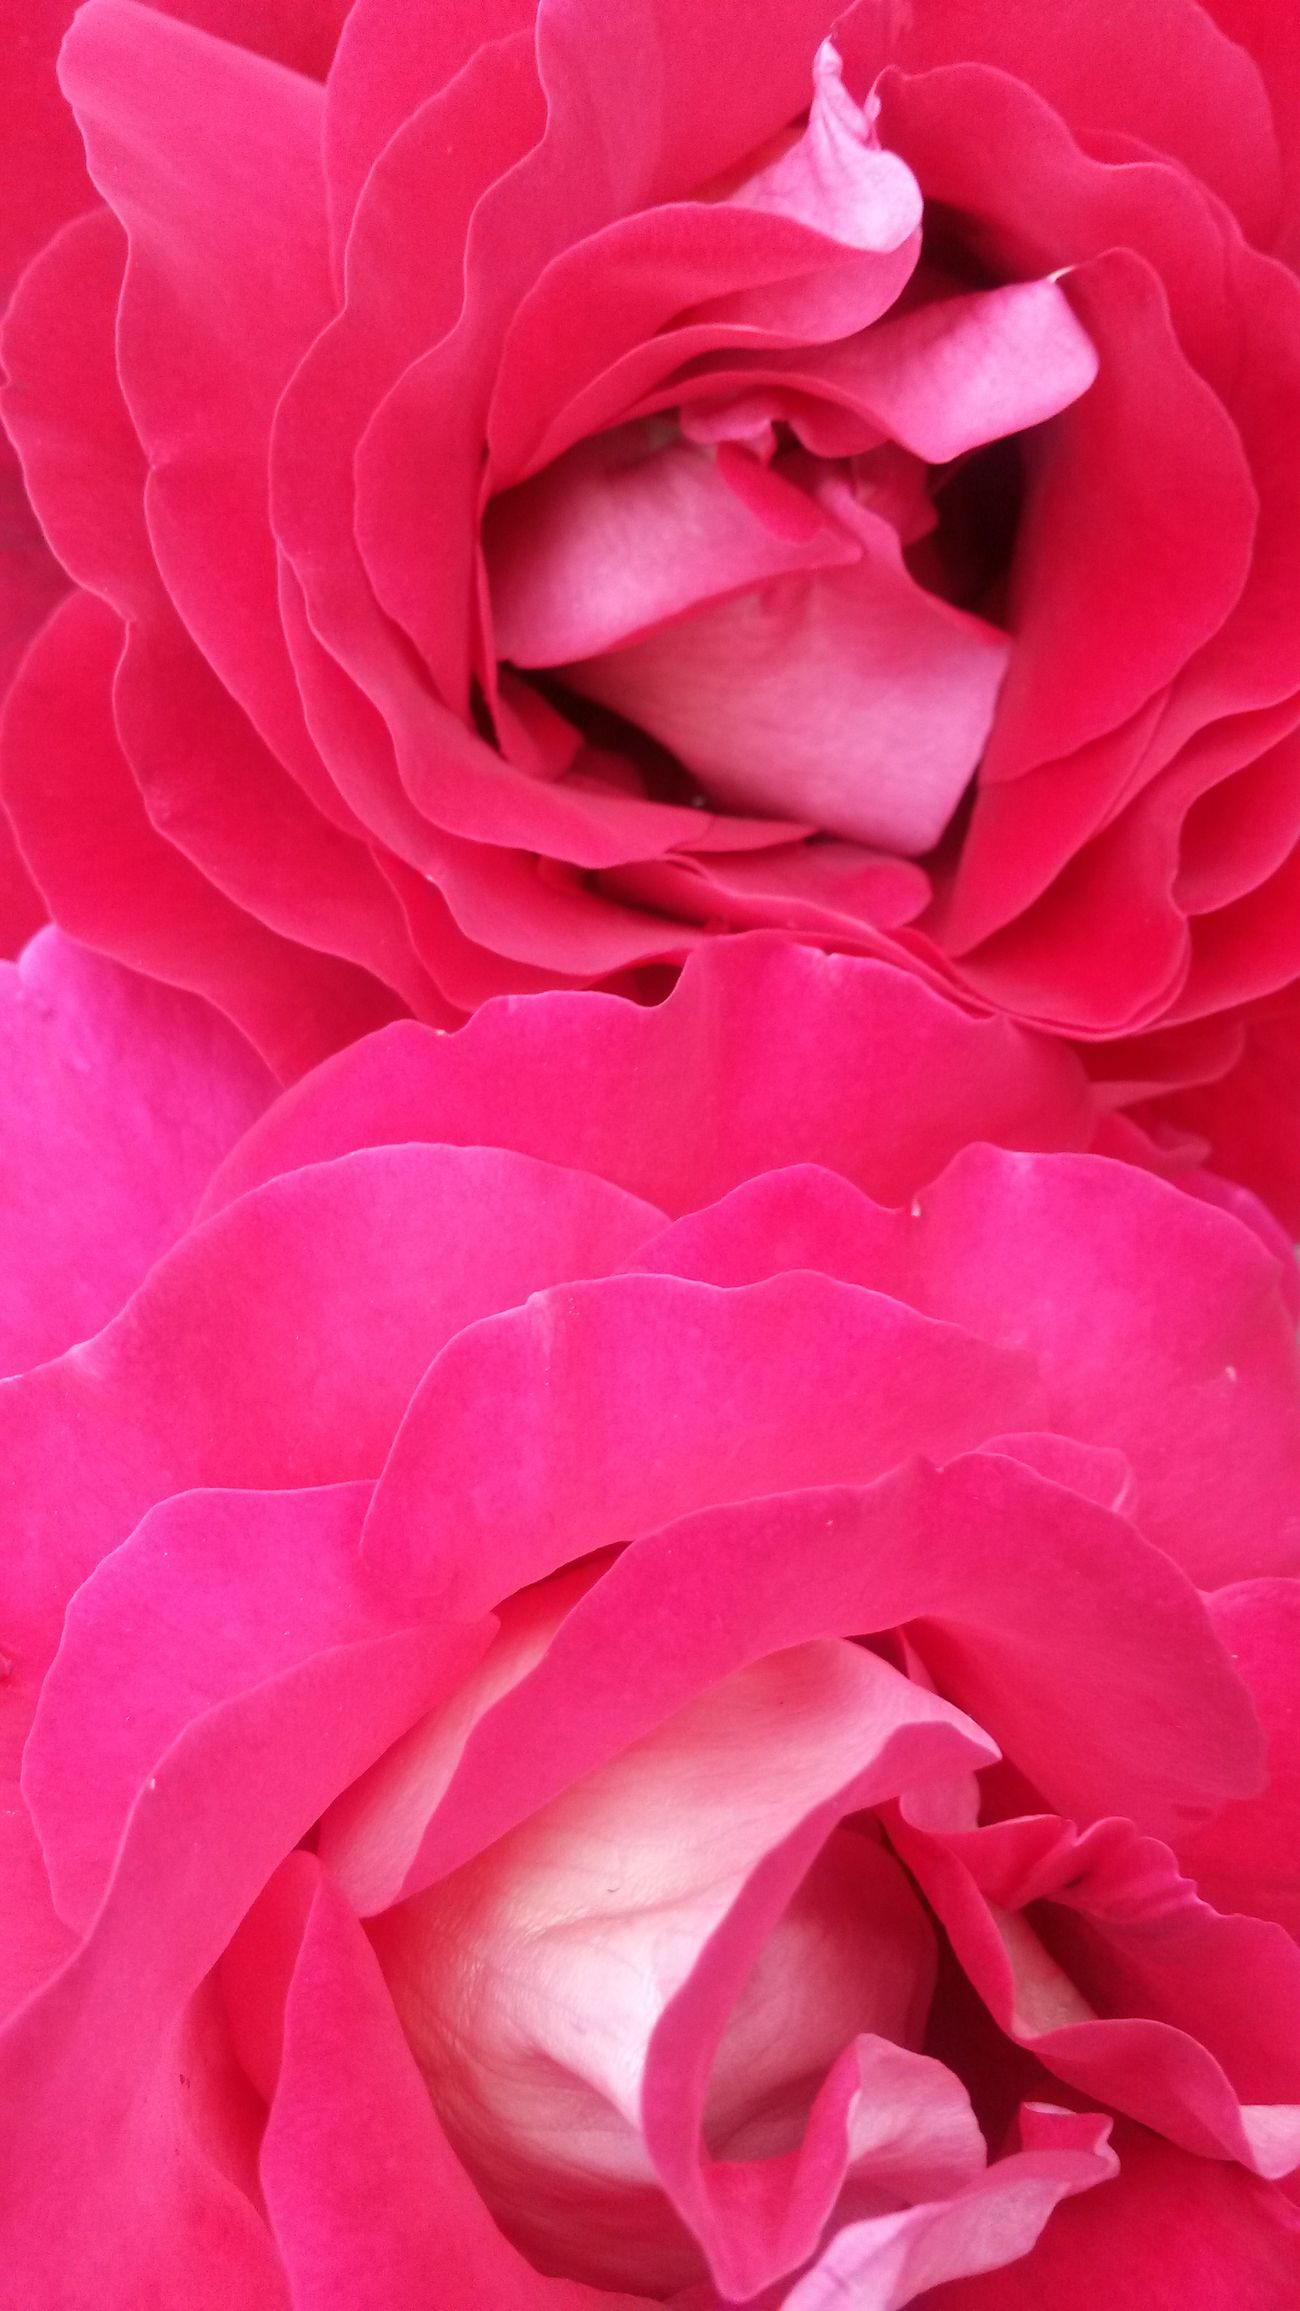 Roses Roseflower Plants Pink Flower Pink